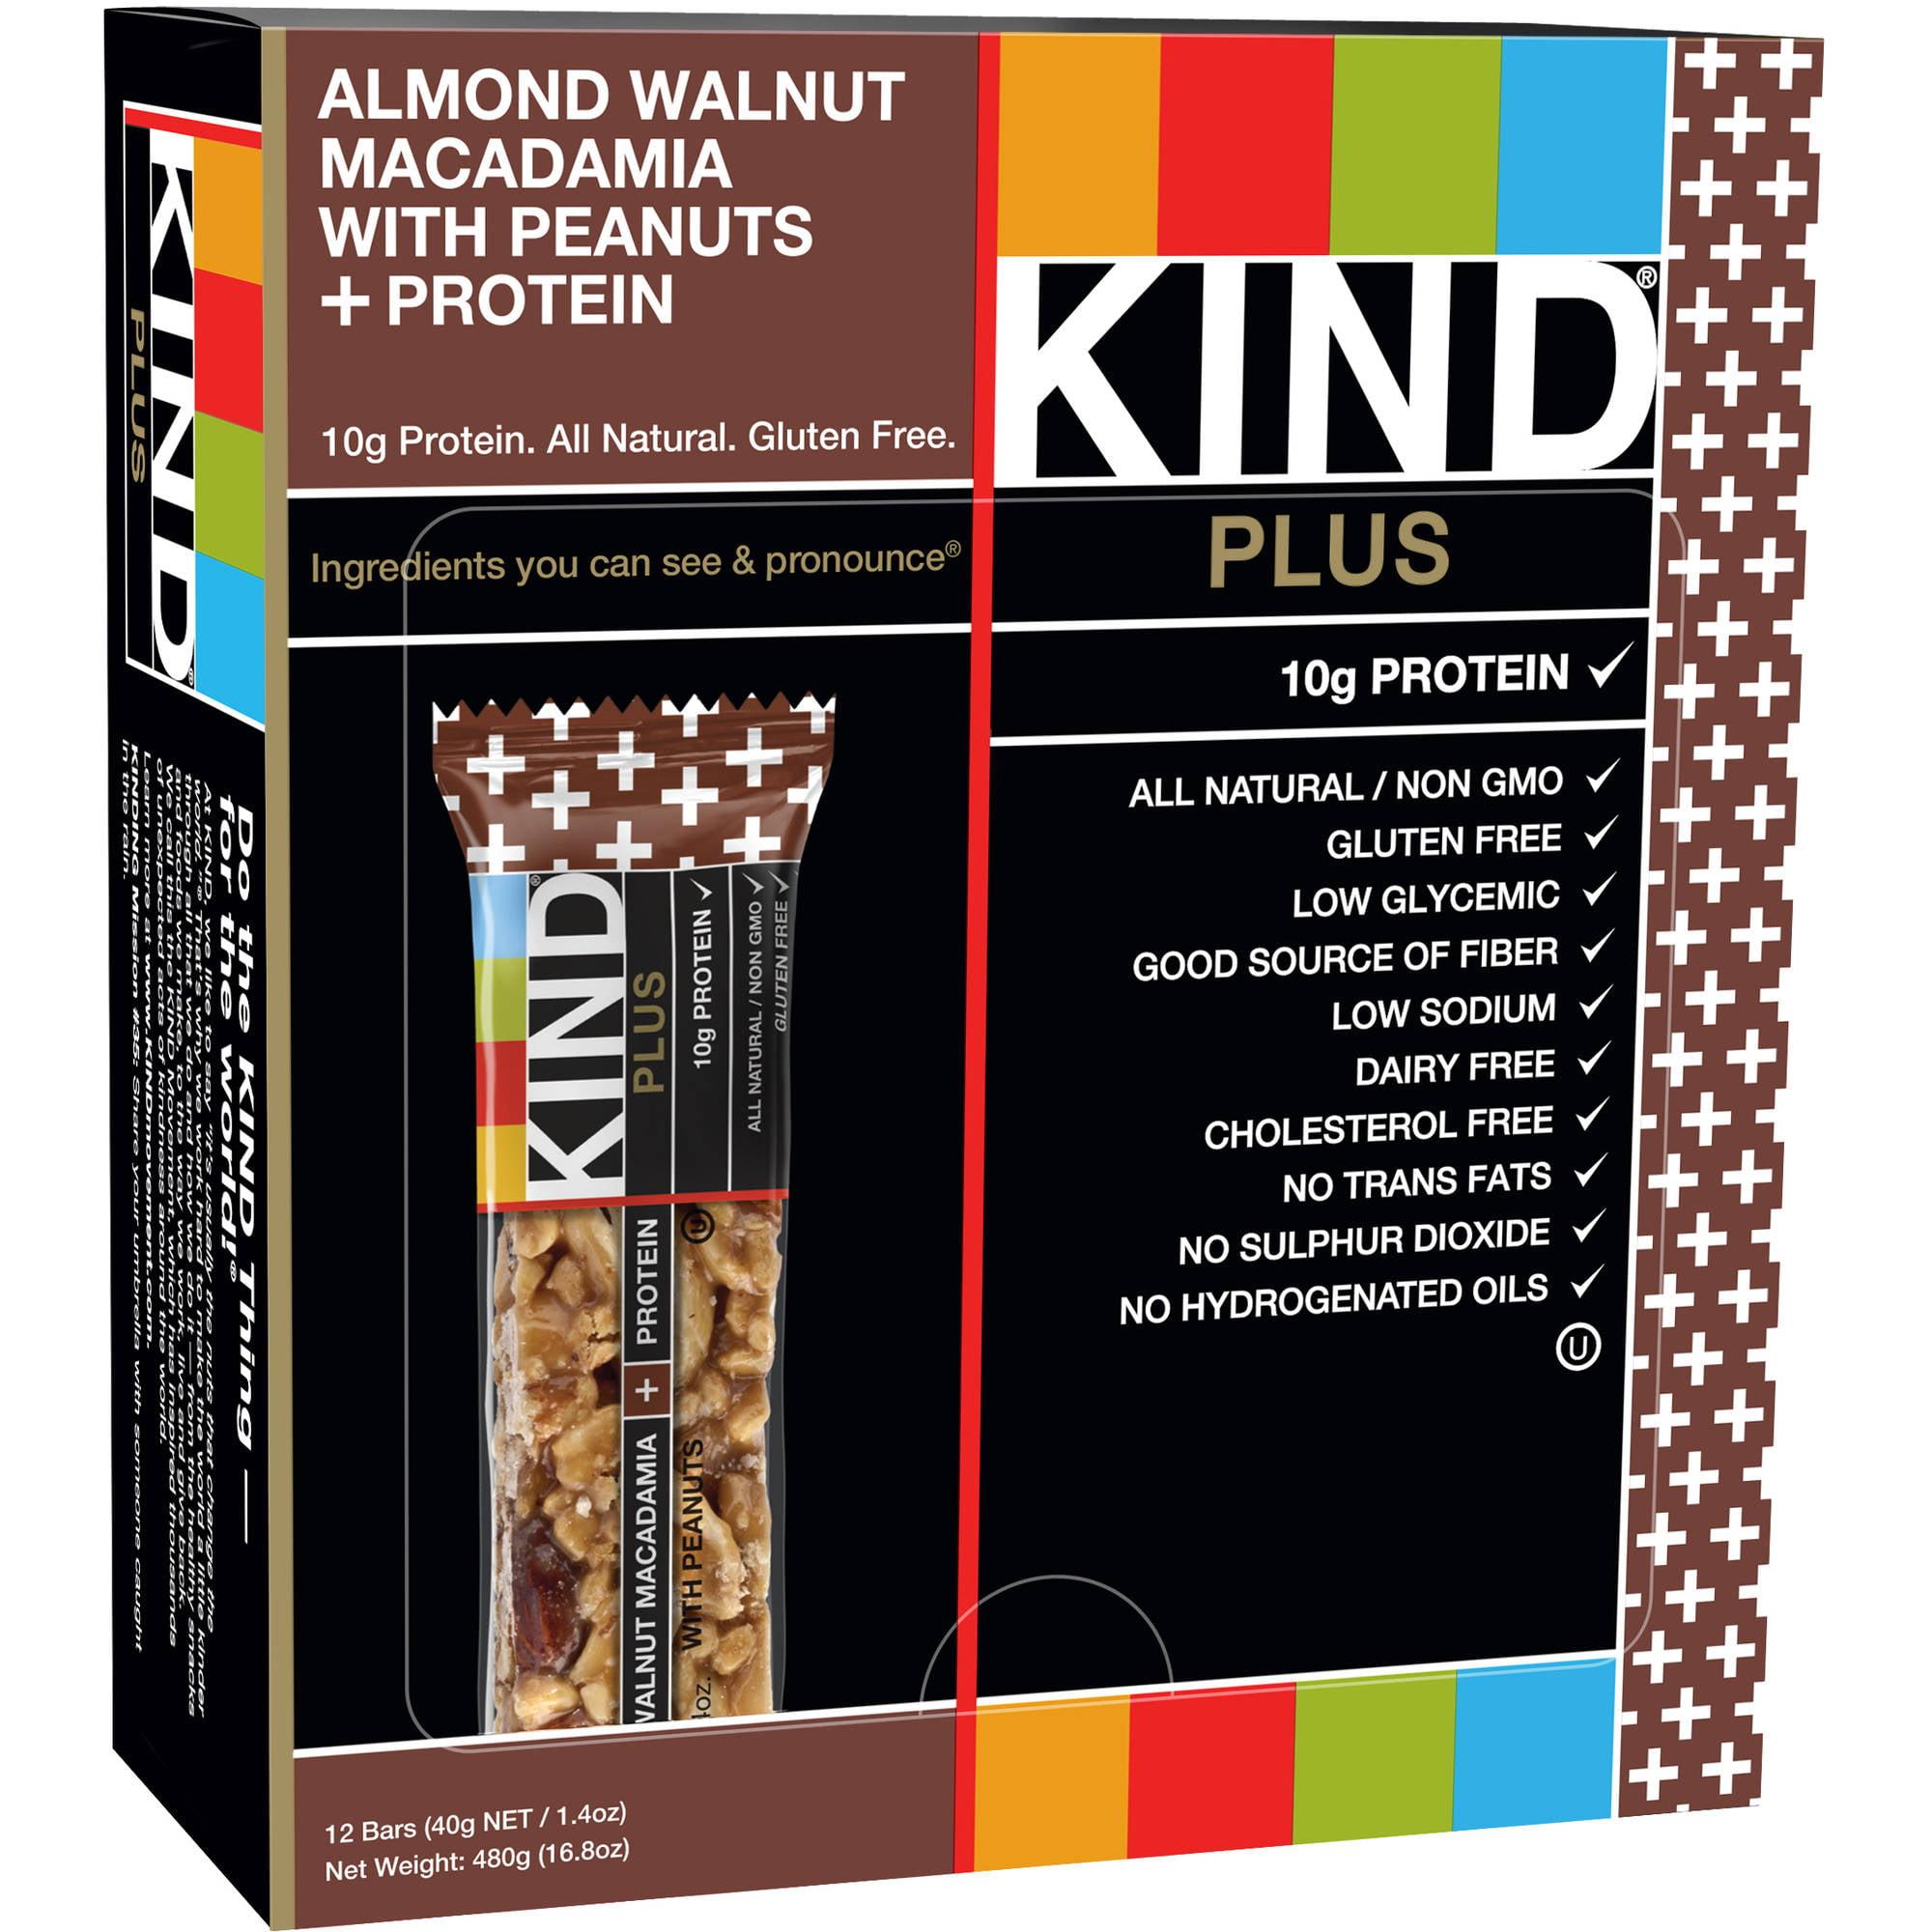 KIND PLUS Bars, Almond Walnut Macadamia + Protein, 1.4 Ounces, 12 Count